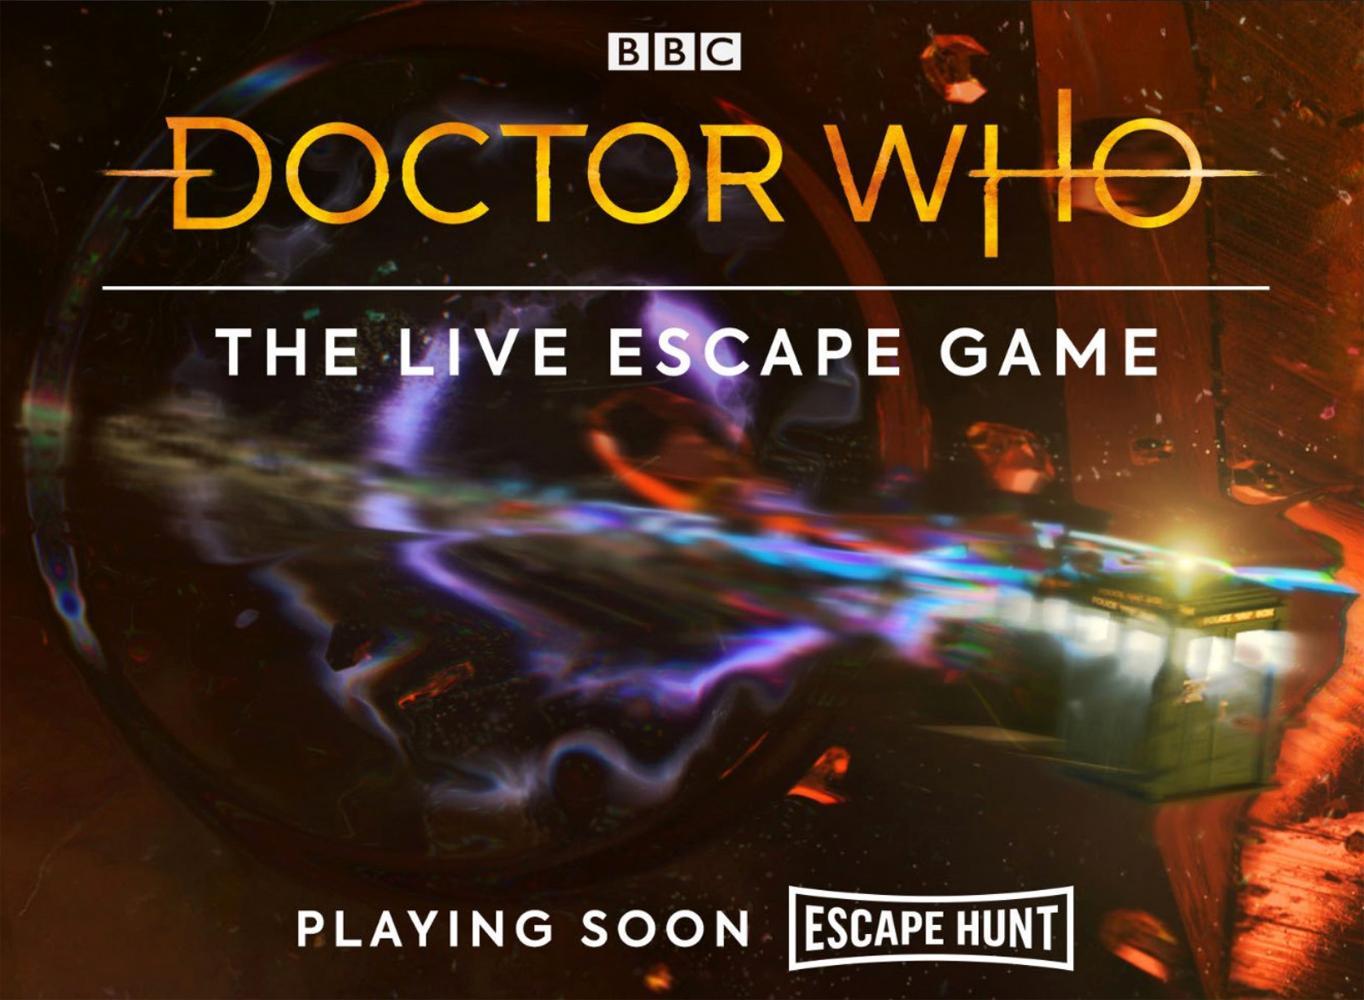 Doctor Who Escape Game artwork